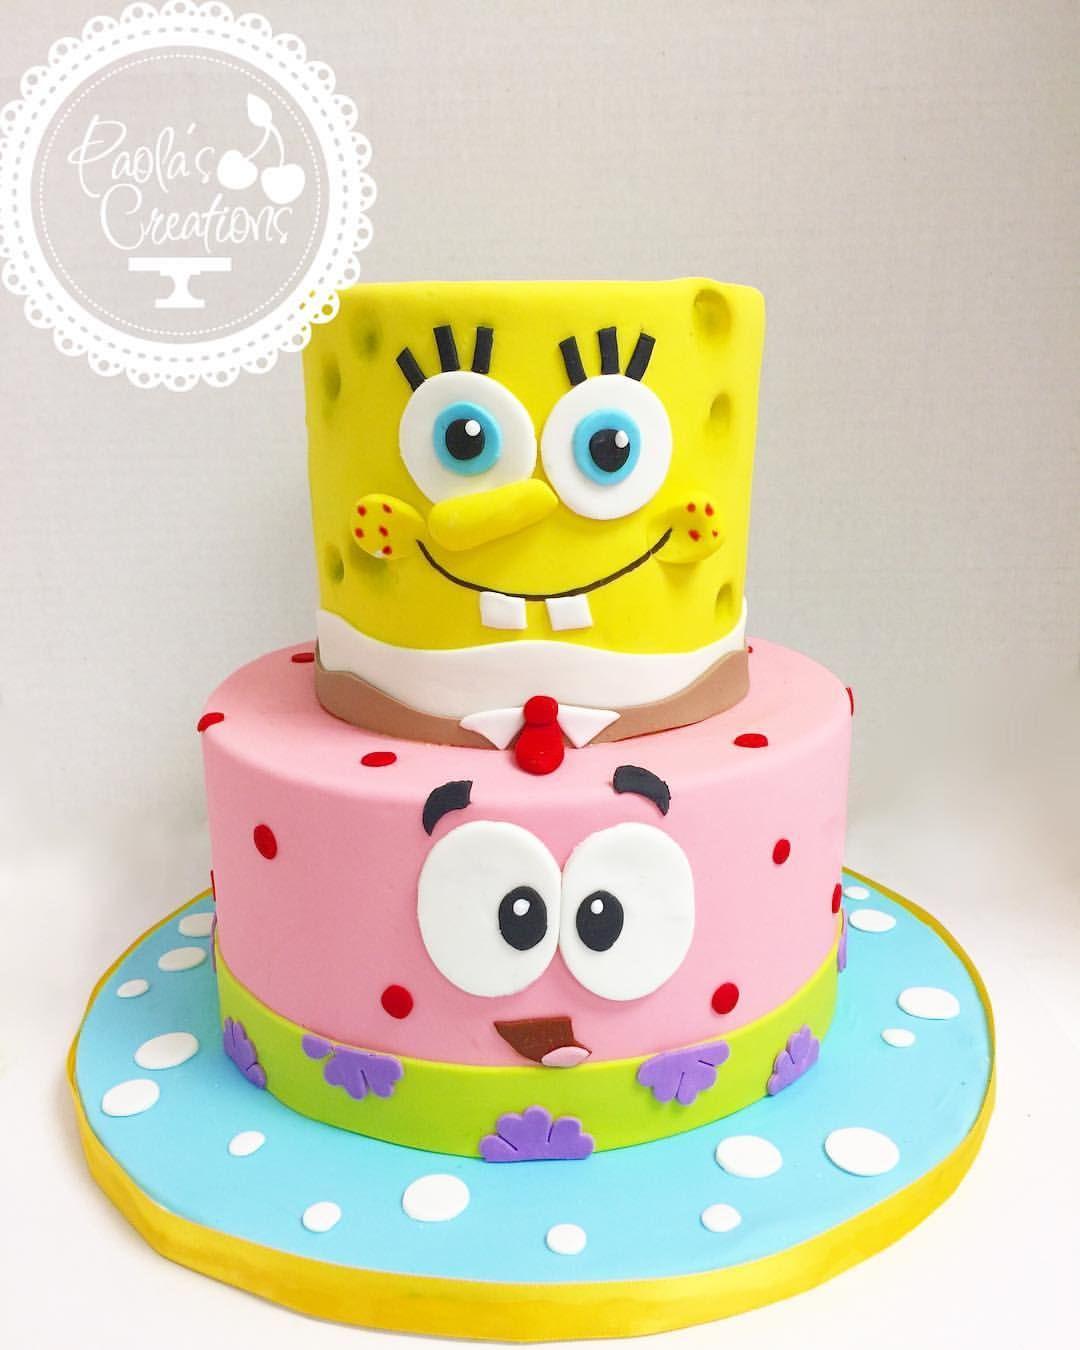 Sensational Sponge Bob And Patrick Inspired Cake Spongebob Personalised Birthday Cards Cominlily Jamesorg